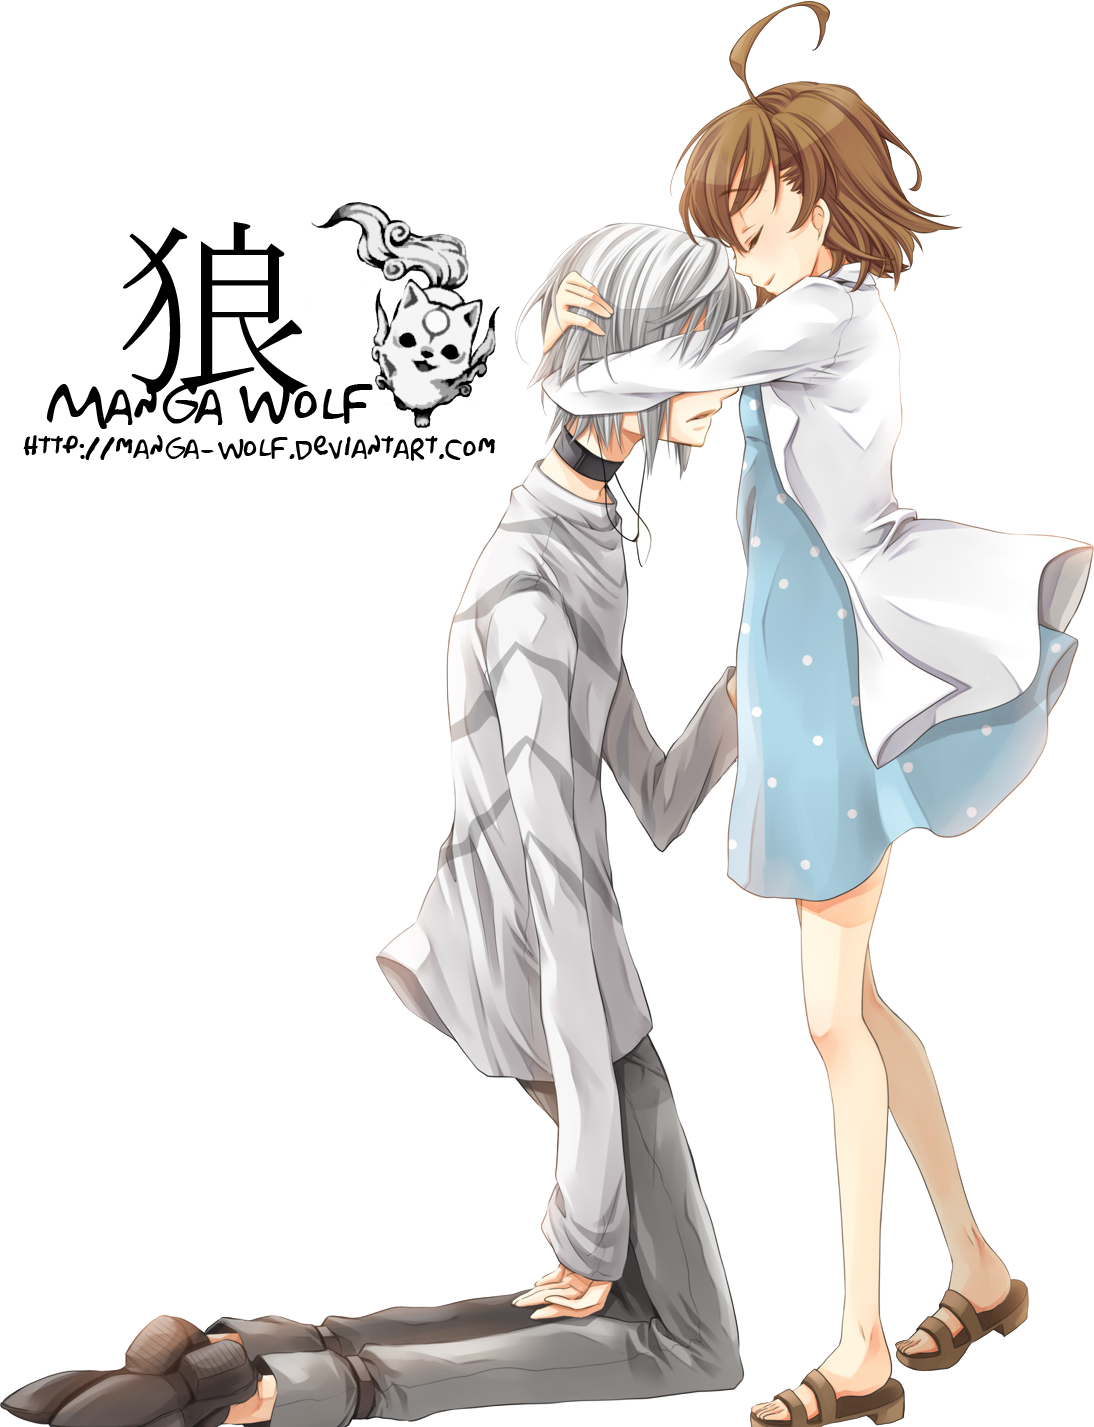 Accelerate hugging girl render 1 by manga wolf on deviantart - Anime boy hugging girl ...